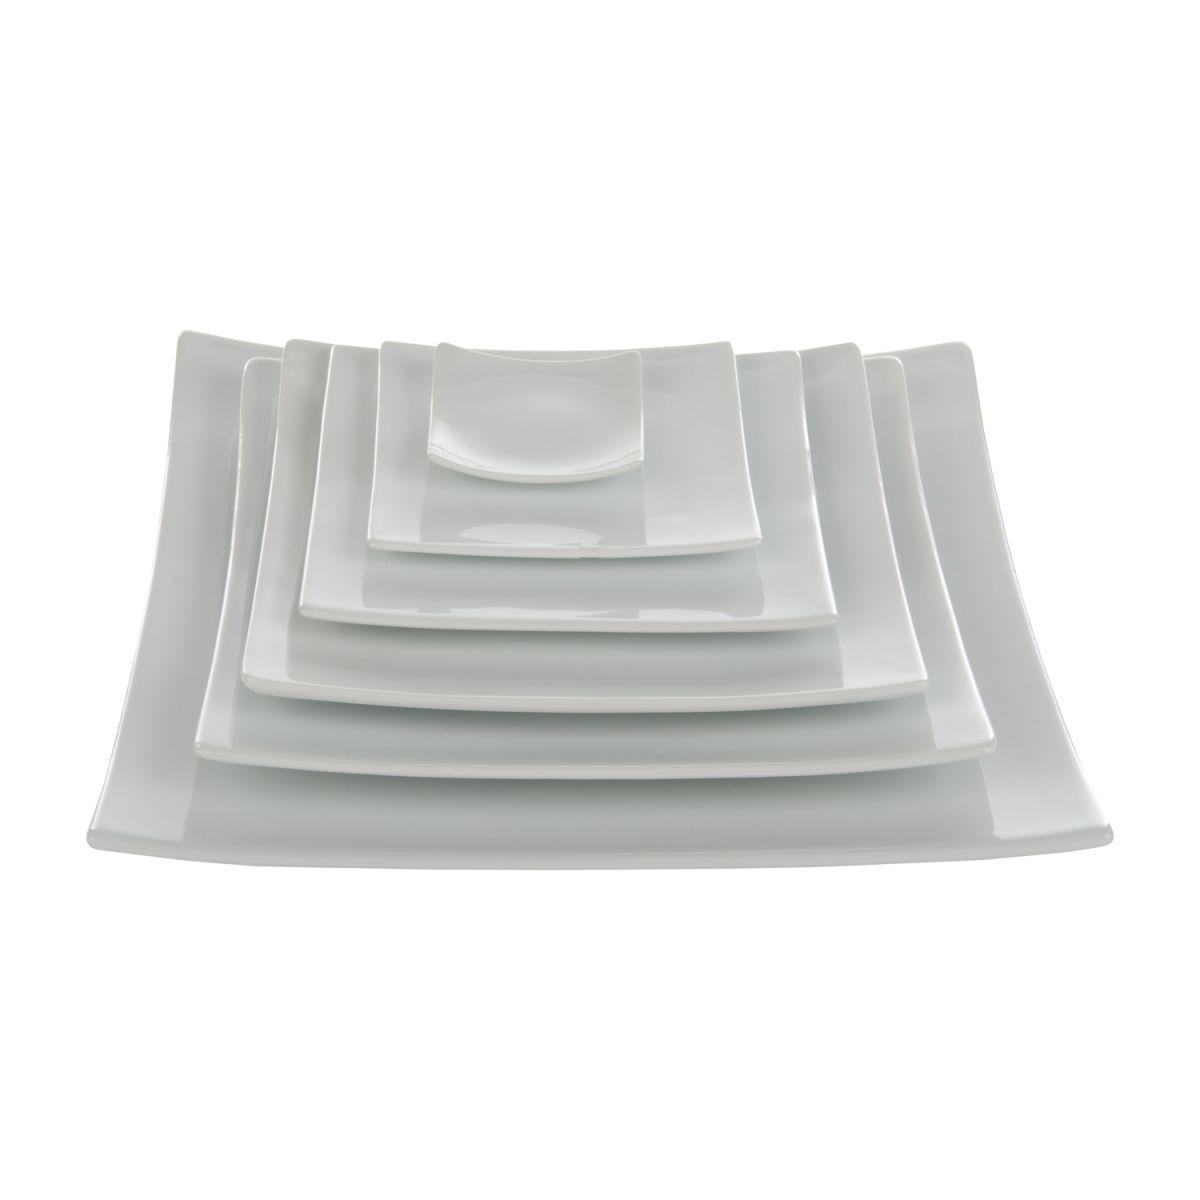 plate plain square 28 x 28 cm box3